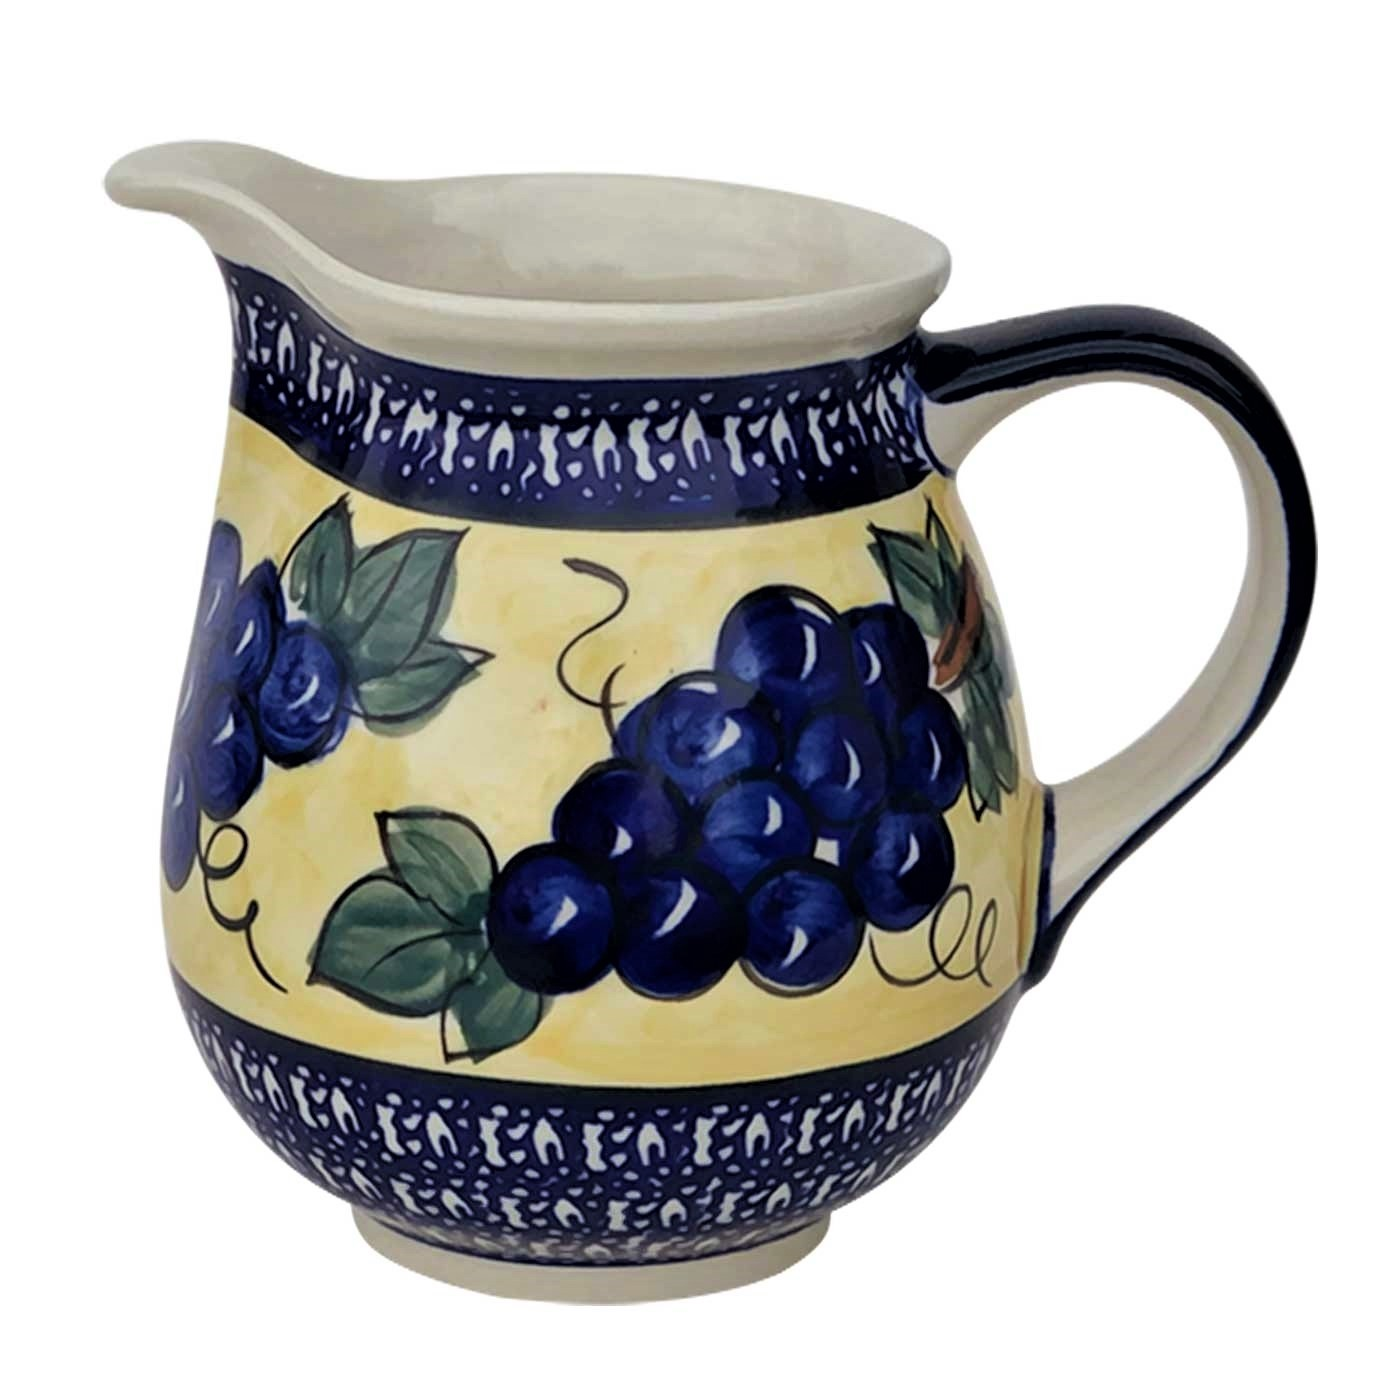 Pottery Avenue Medium Stoneware Pitcher - 951-DU8, 3.6-cup